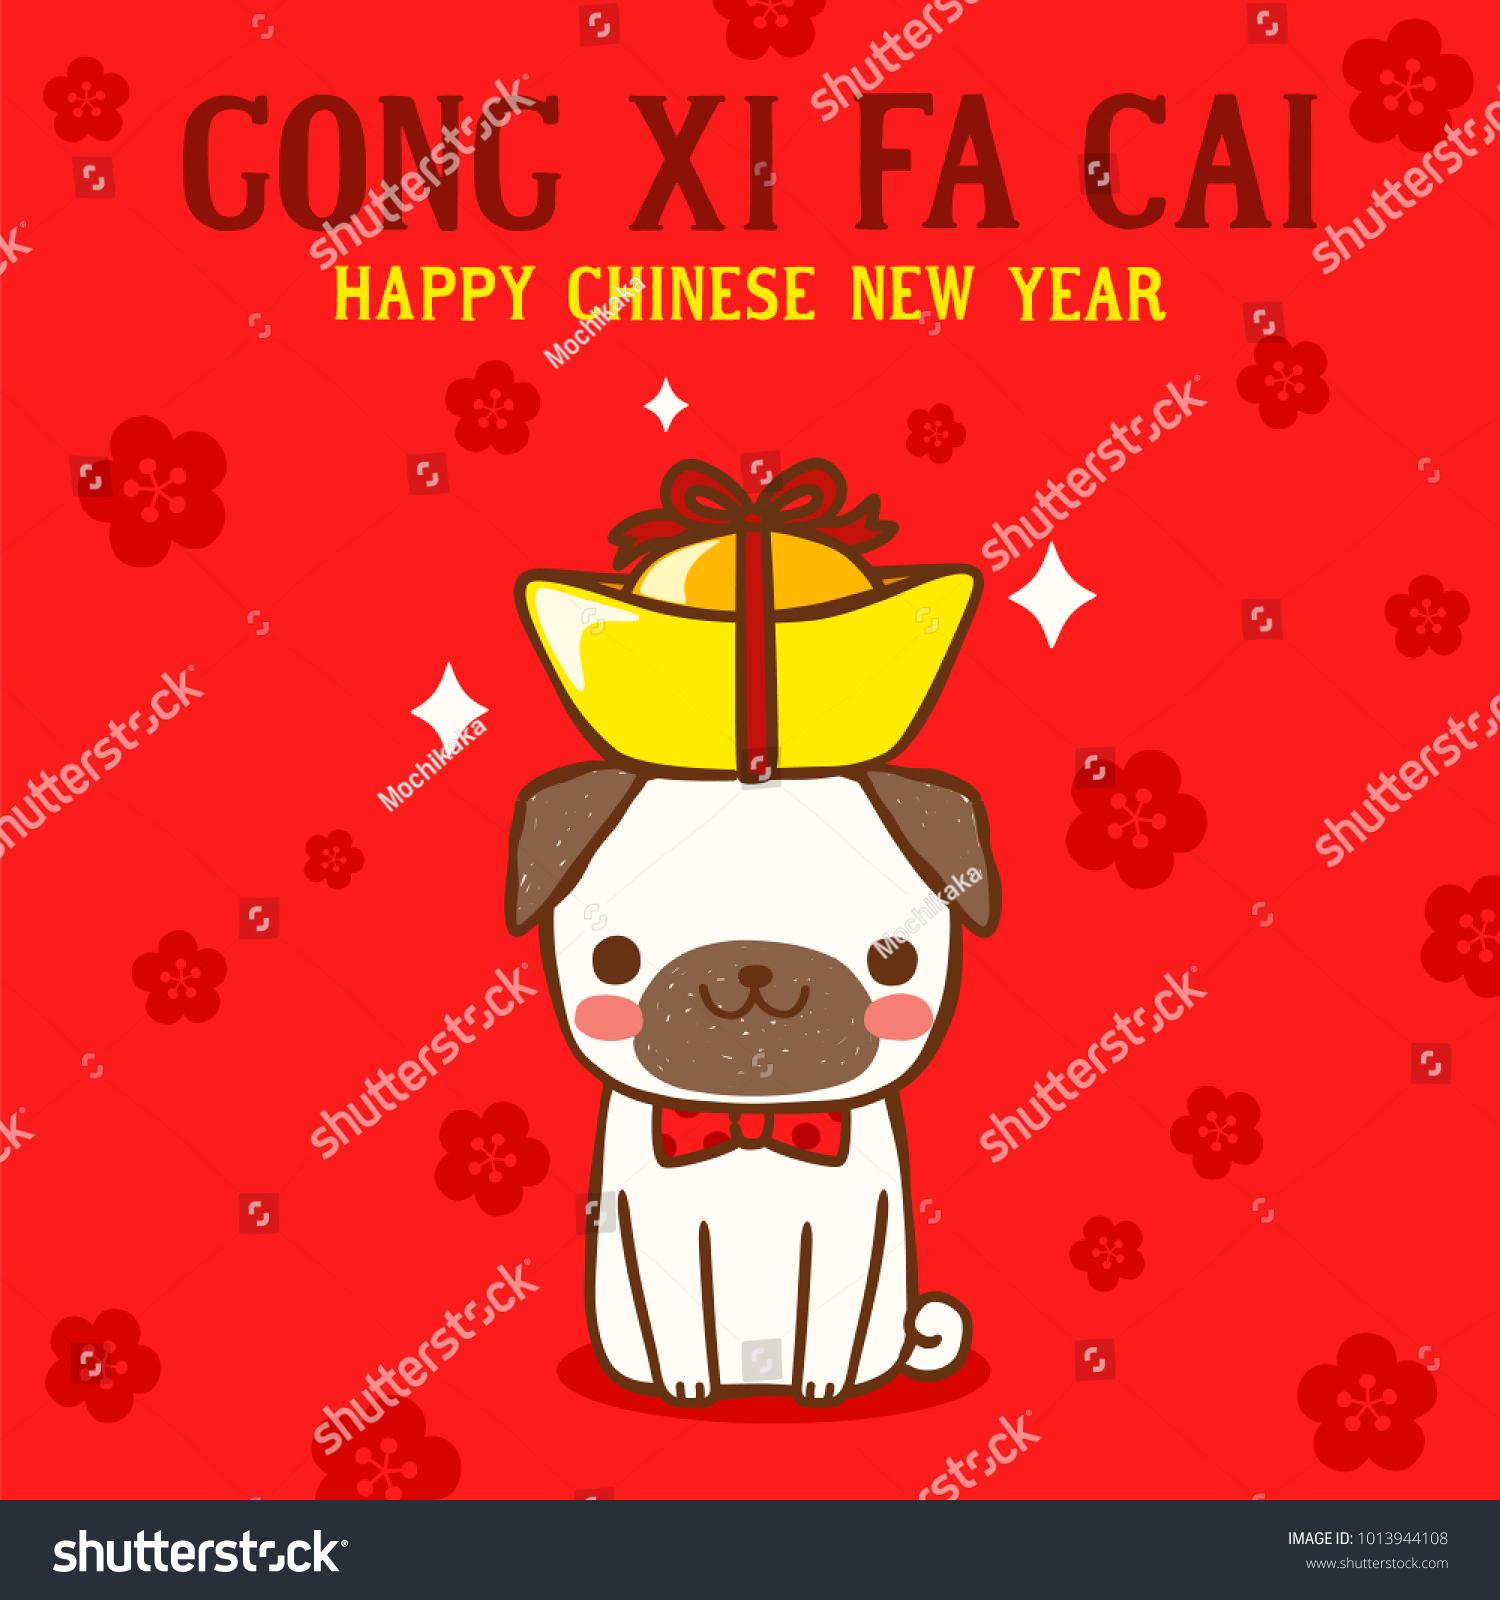 Happy Chinese New Year Cute Cartoon Stock Vector Royalty Free